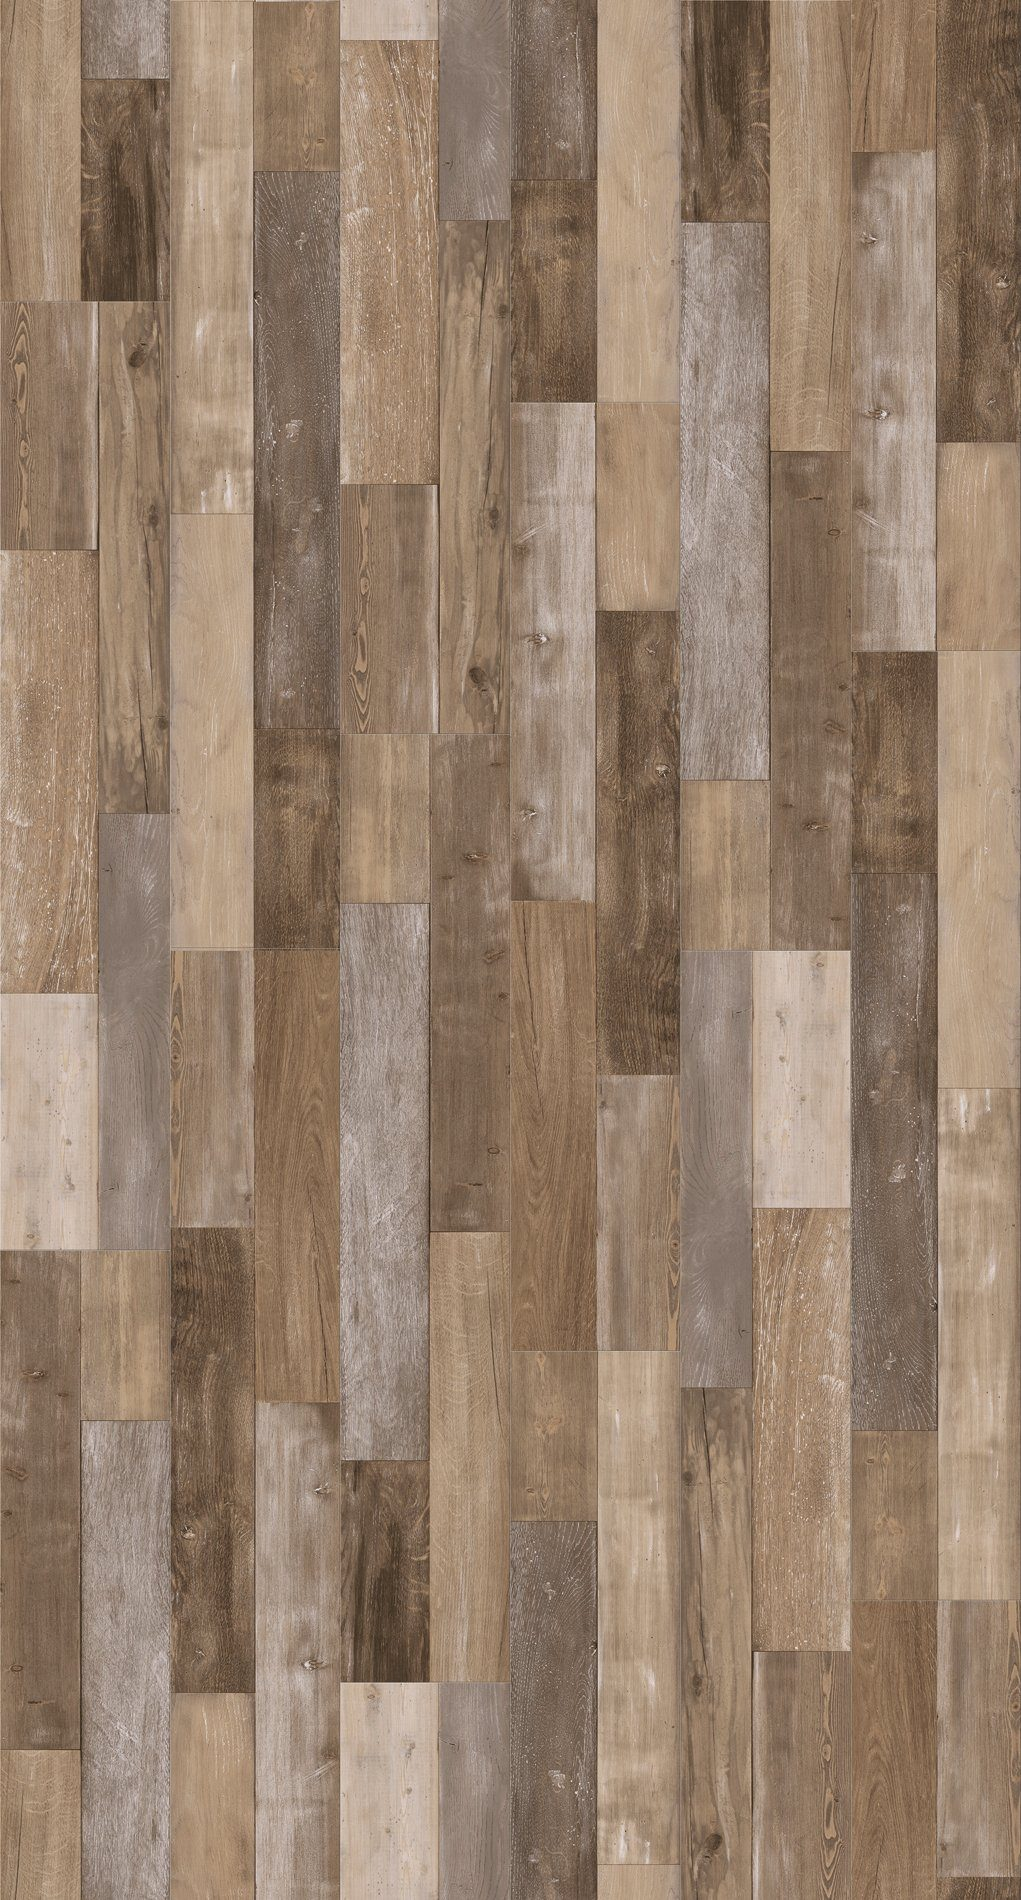 PARADOR Packung: Vinylboden »Classic 2050 - Shufflewood wild«, 1220 x 219 x 5 mm, 2,1 m²